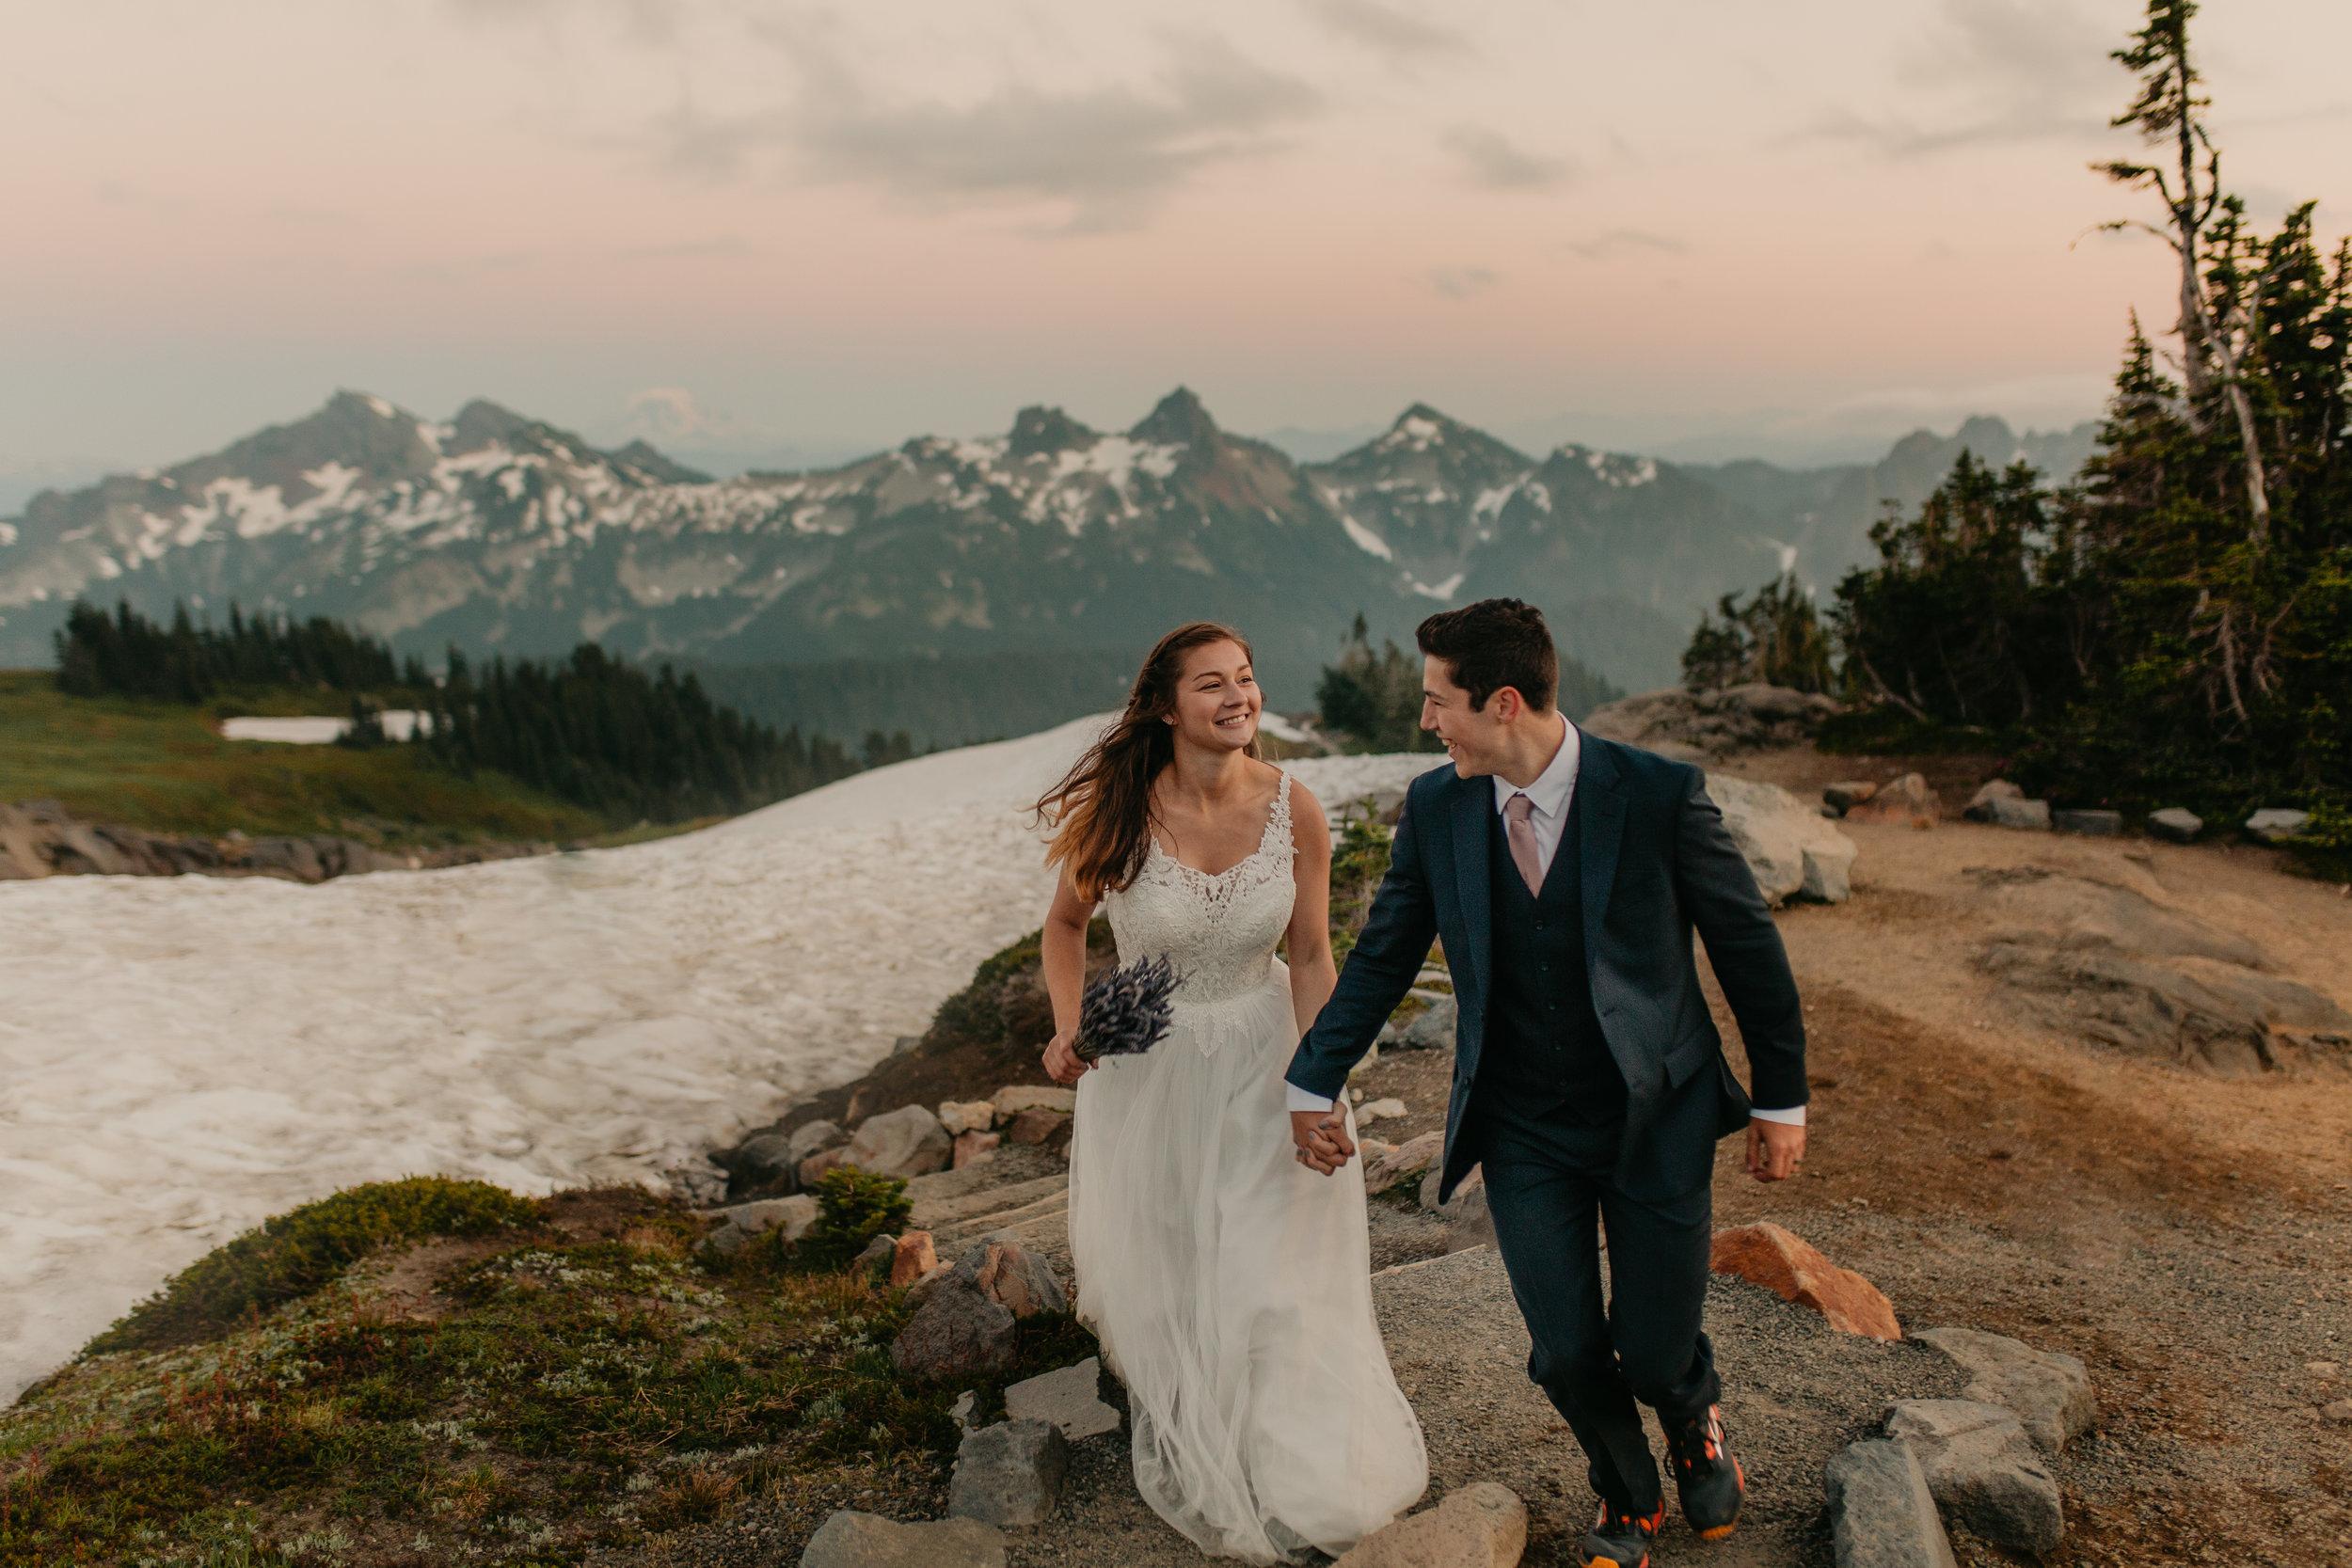 Nicole-Daacke-Photography-Mt-Rainier-elopement-photographer-washington-mountain-epic-wedding-photography-wildflowers-at-rainier-pine-tree-cloudy-summer-day-at-mountain-rainier-70.jpg